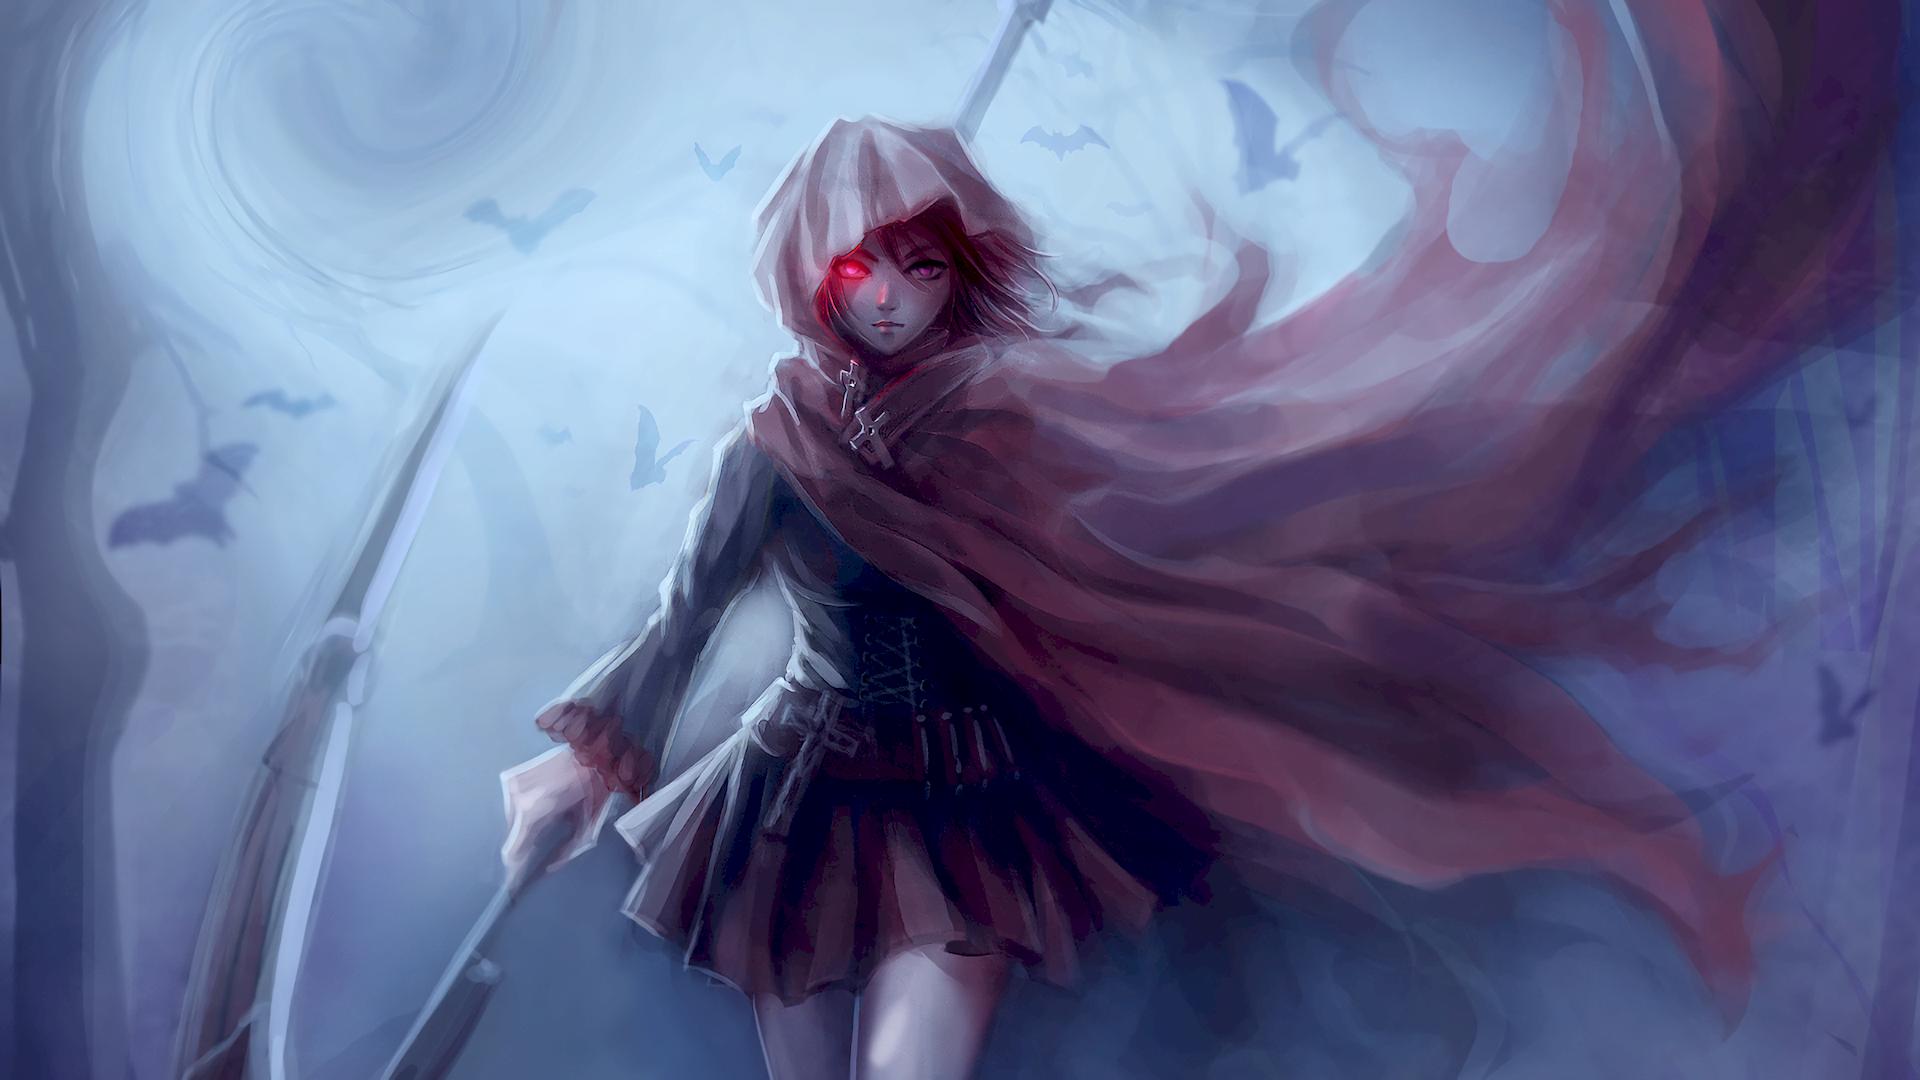 Anime-RWBY-Ruby-Rose-wallpaper-wpc5802157